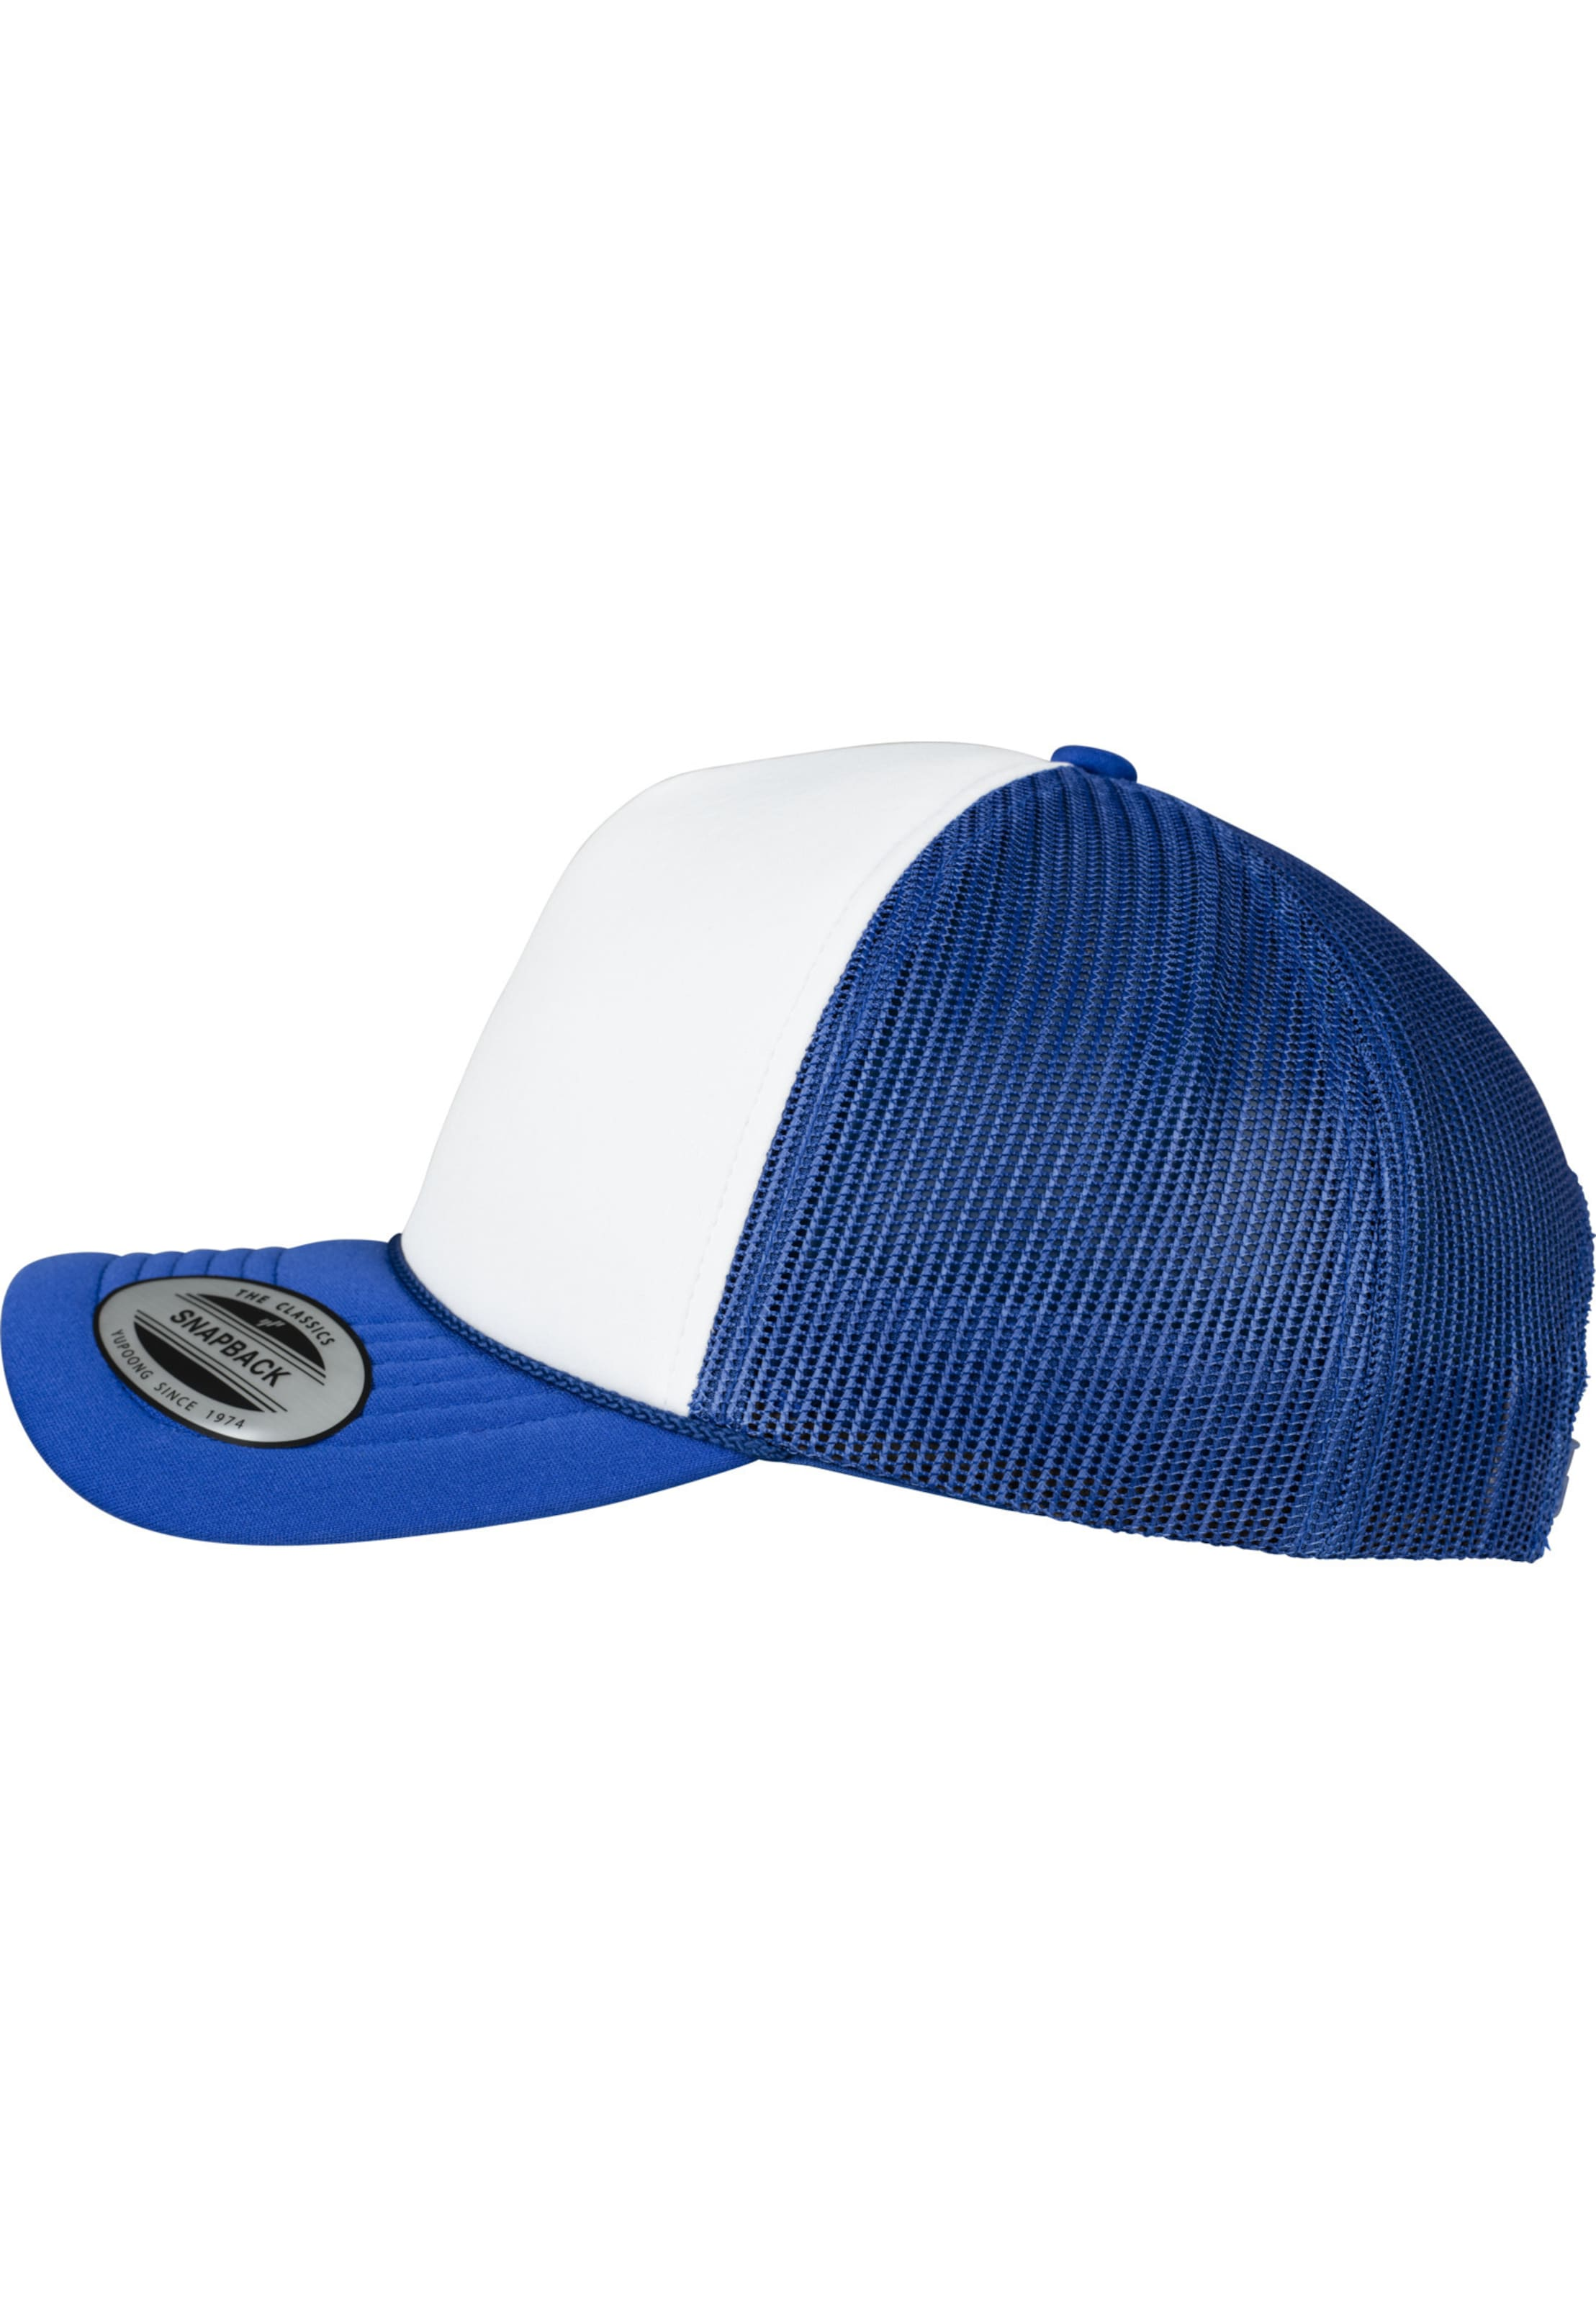 Curved Visor' Cap Flexfit RoyalblauWeiß 'foam In Trucker WED2IH9